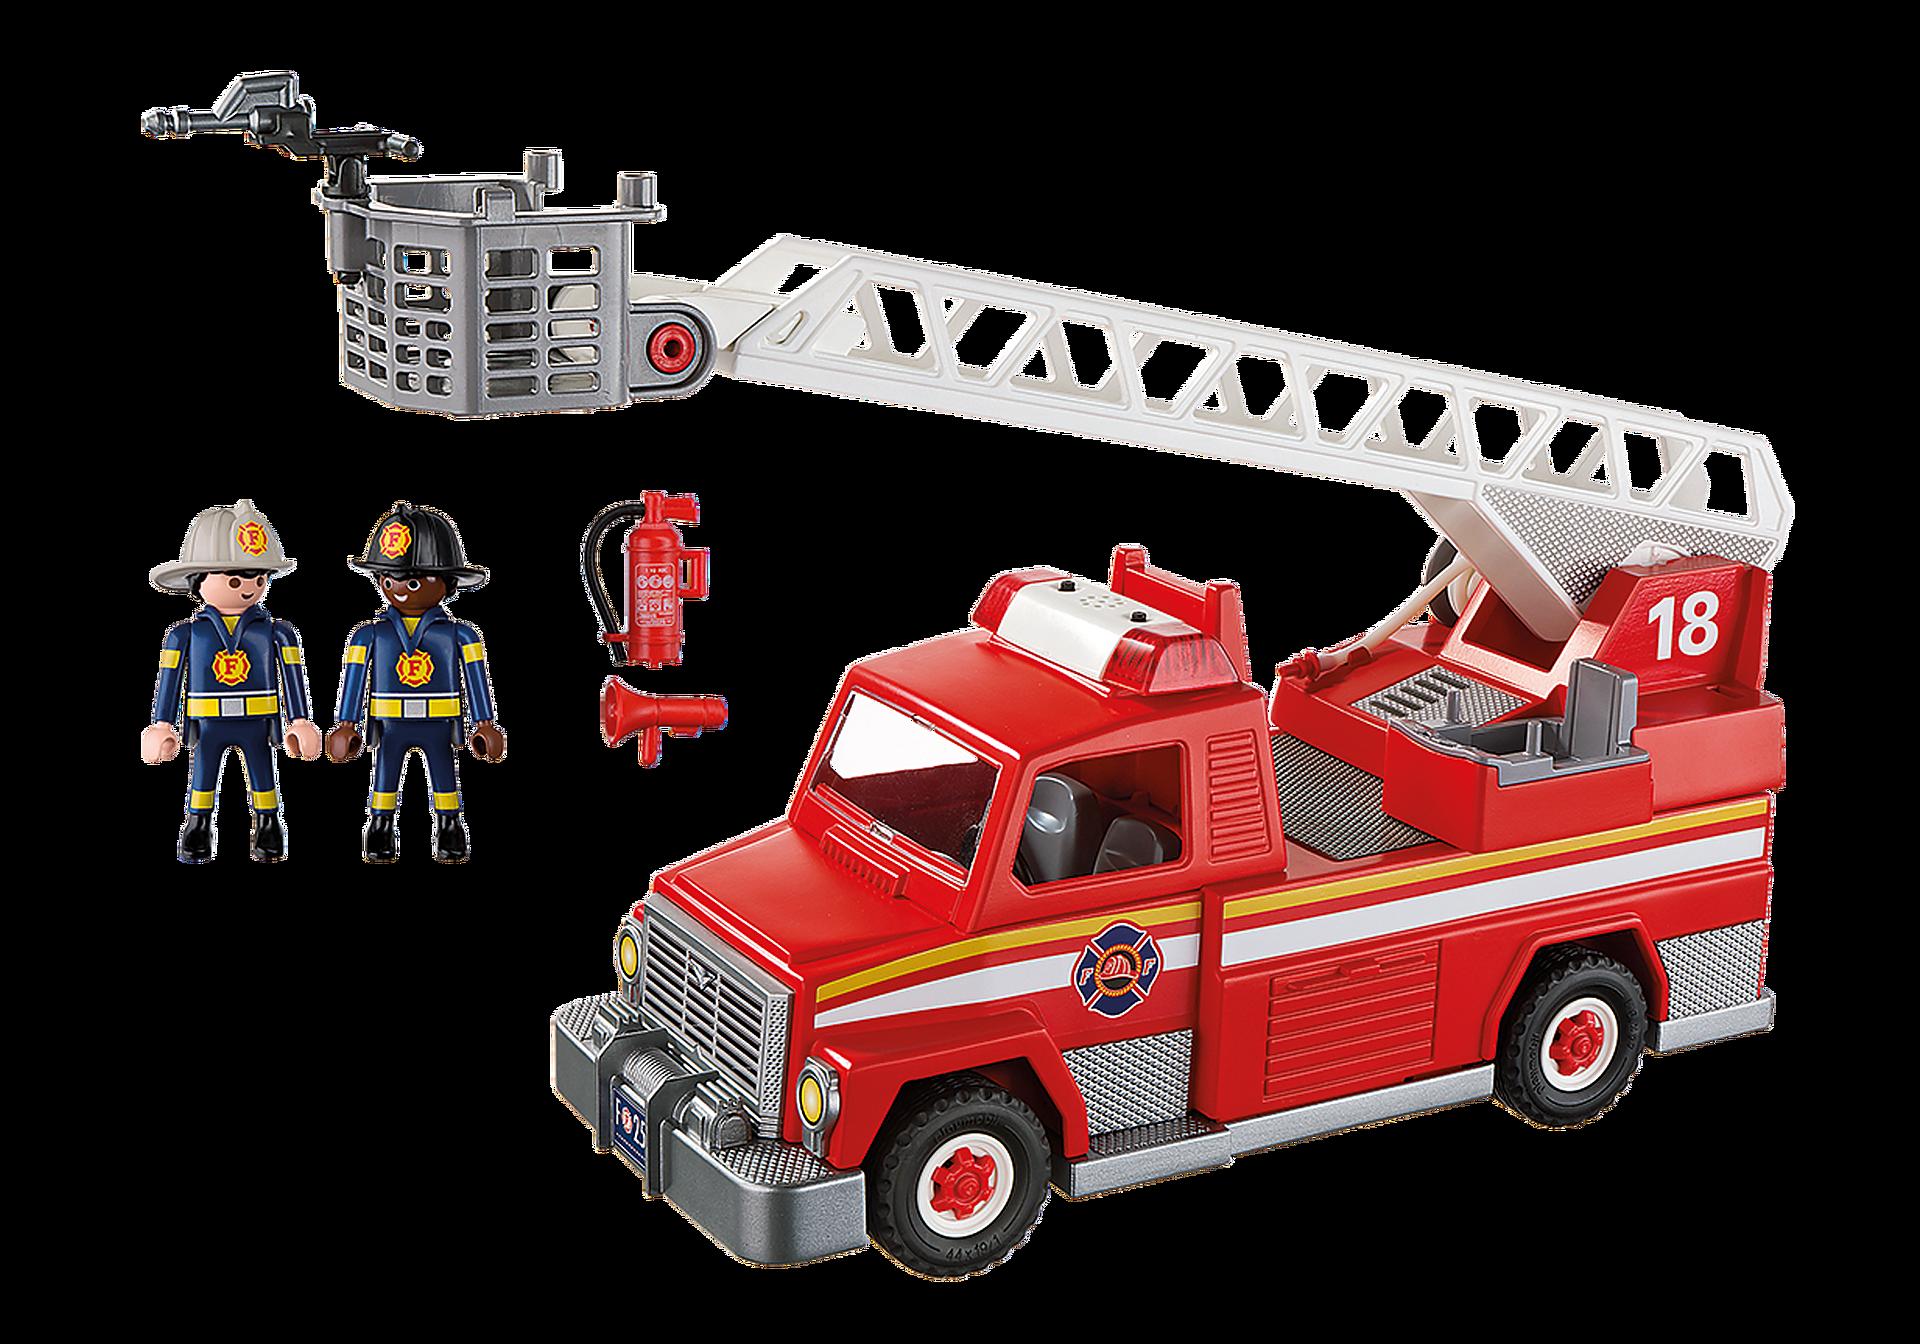 5682 Rescue Ladder Unit zoom image3